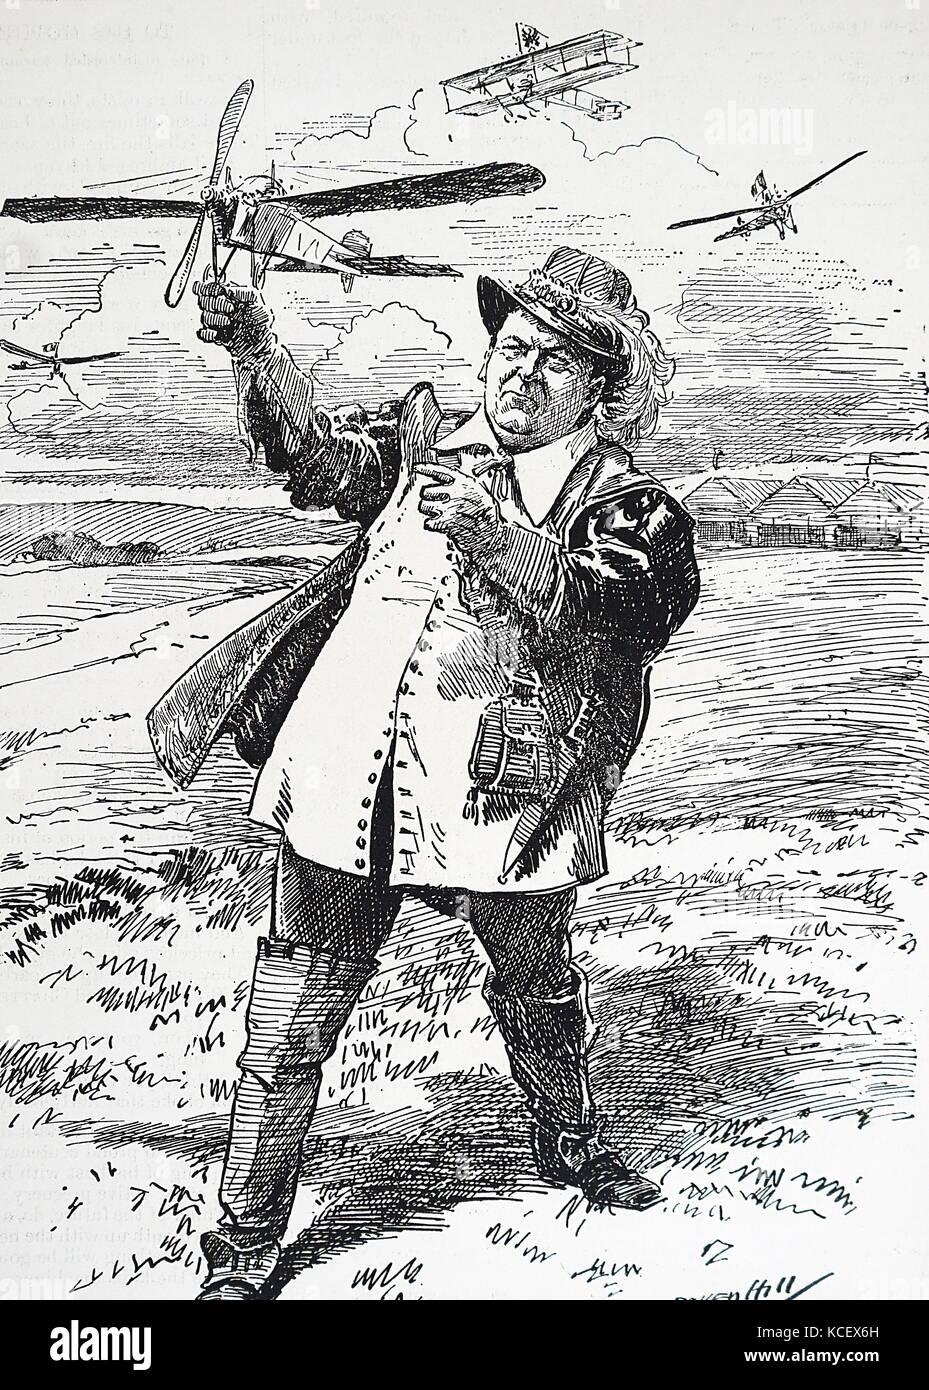 Cartoon depicting Richard Haldane, 1st Viscount Haldane (1856-1928) an influential Scottish Liberal and later Labour - Stock Image